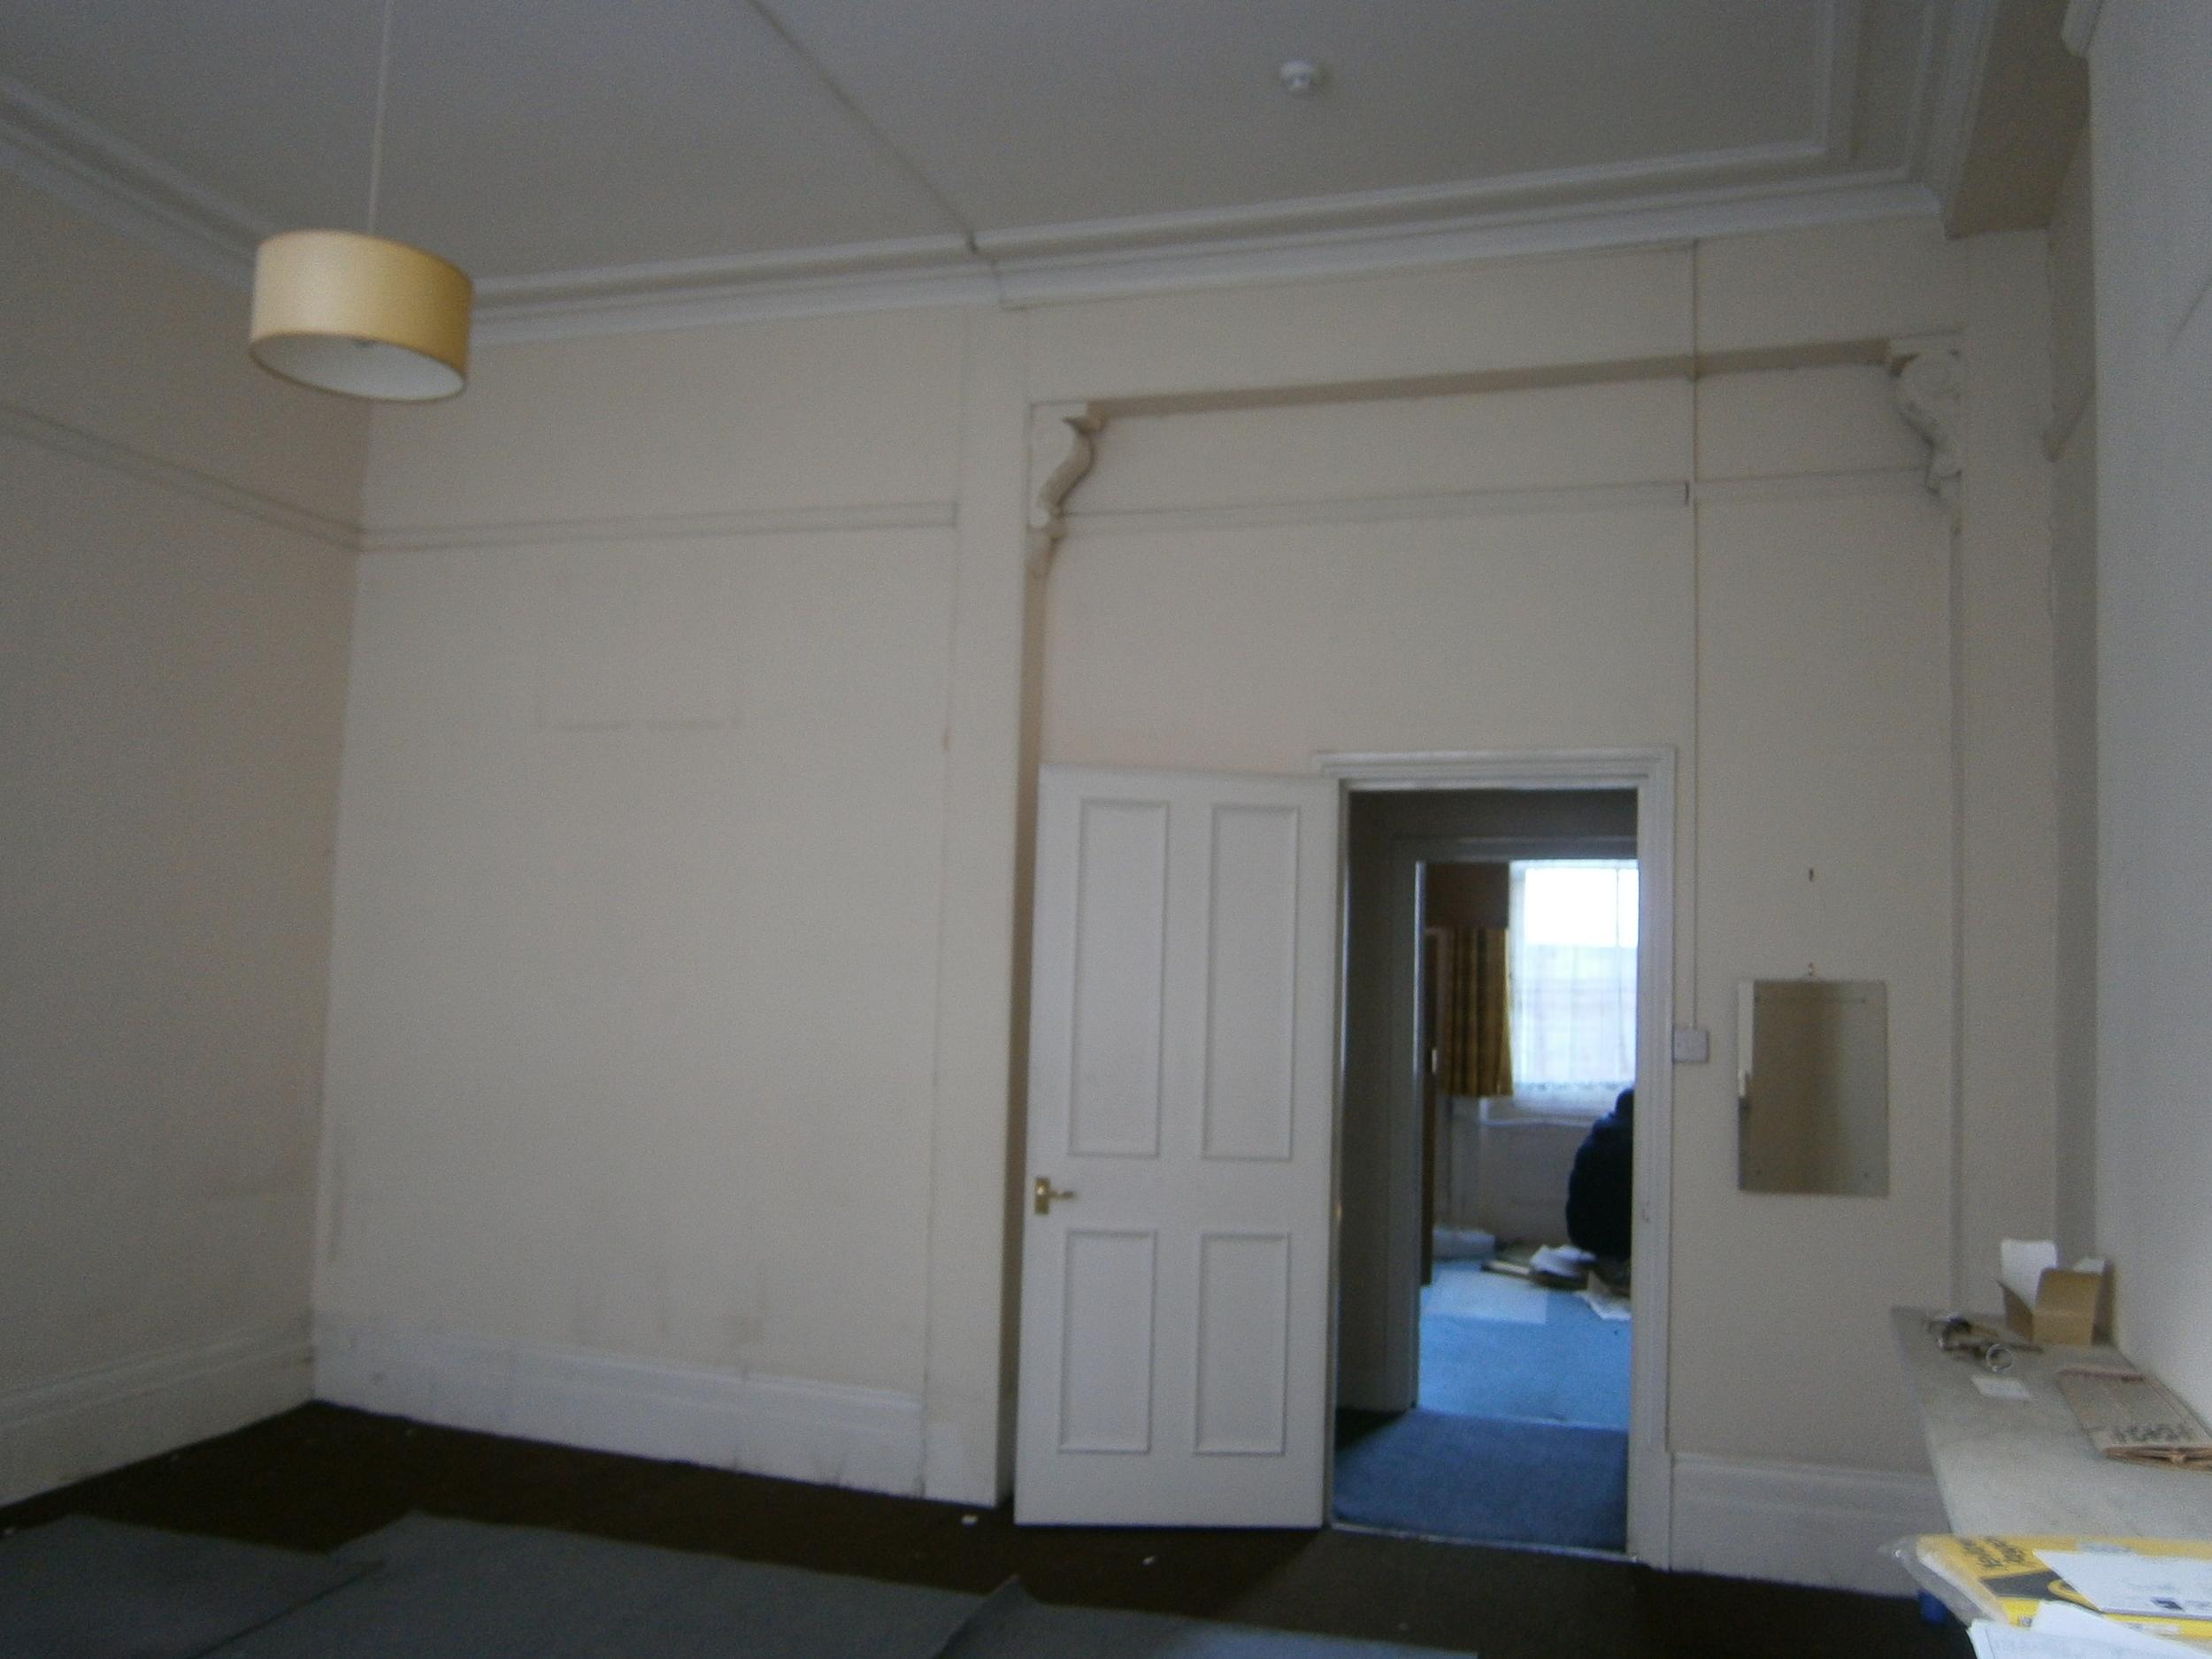 OBR - Dining room before.JPG